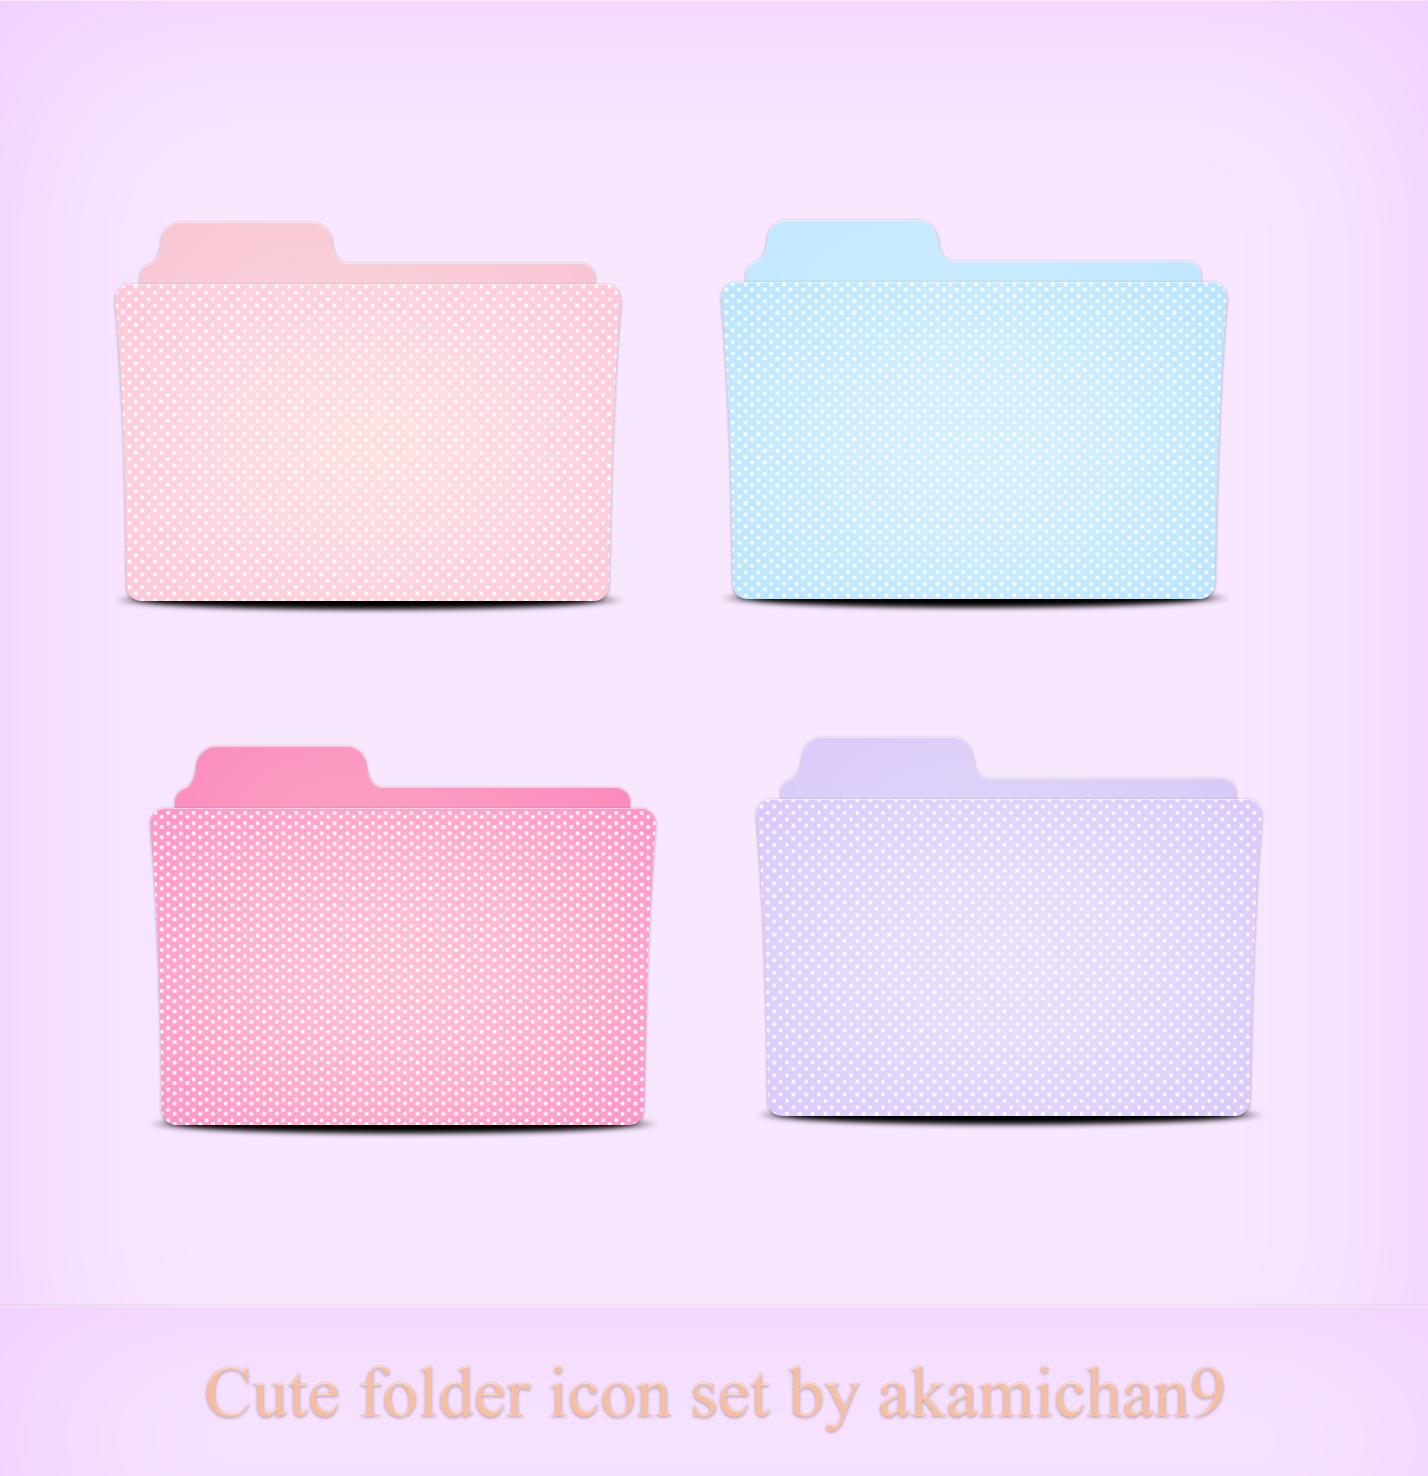 Cute folder icon set by akamichan9 on DeviantArt in 2020